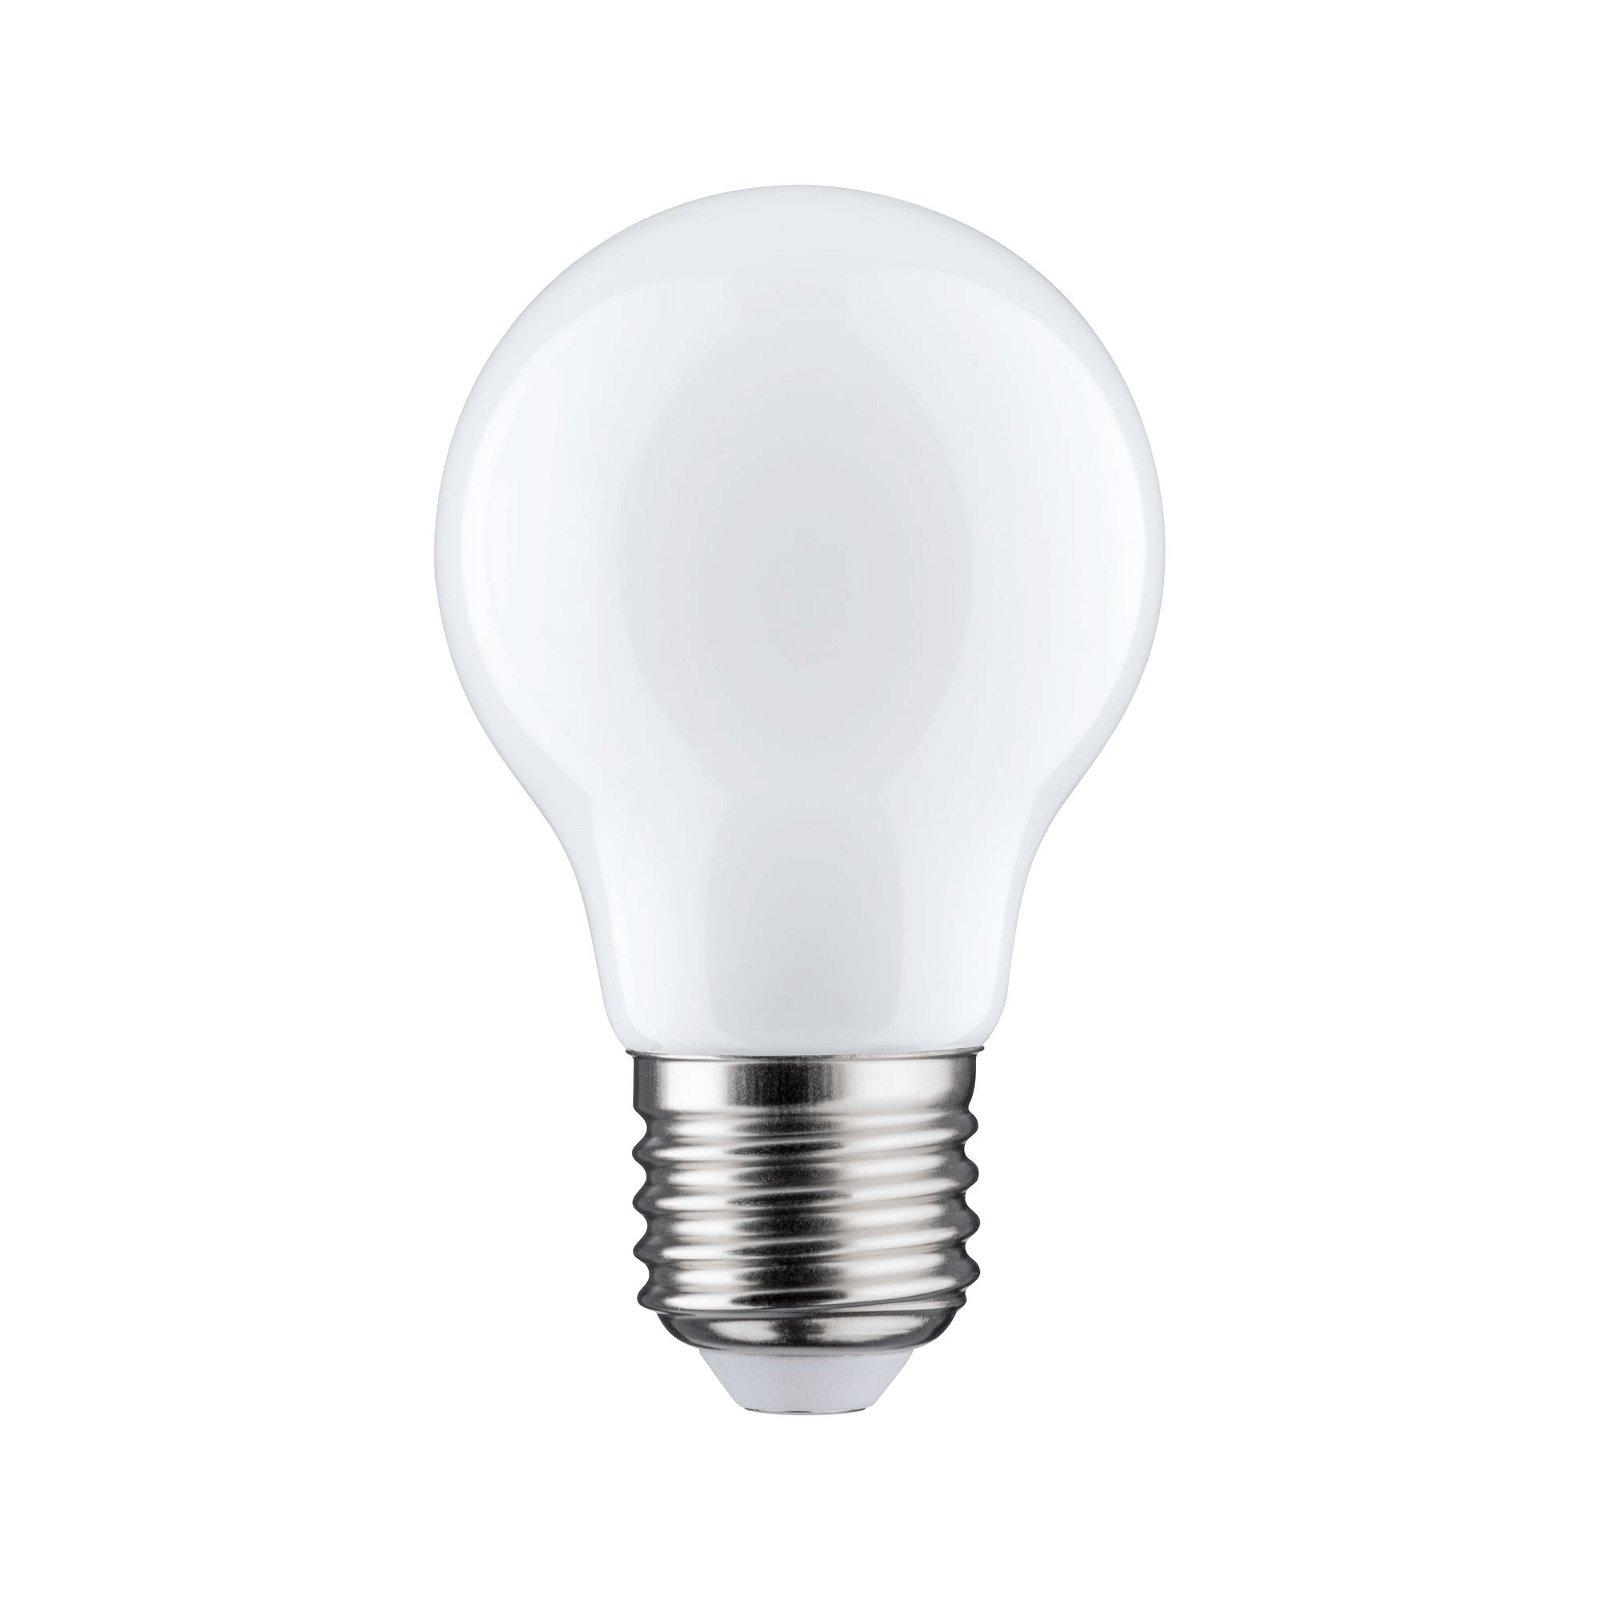 LED AGL 4,5 Watt E27 Opal 230 V Warmweiß